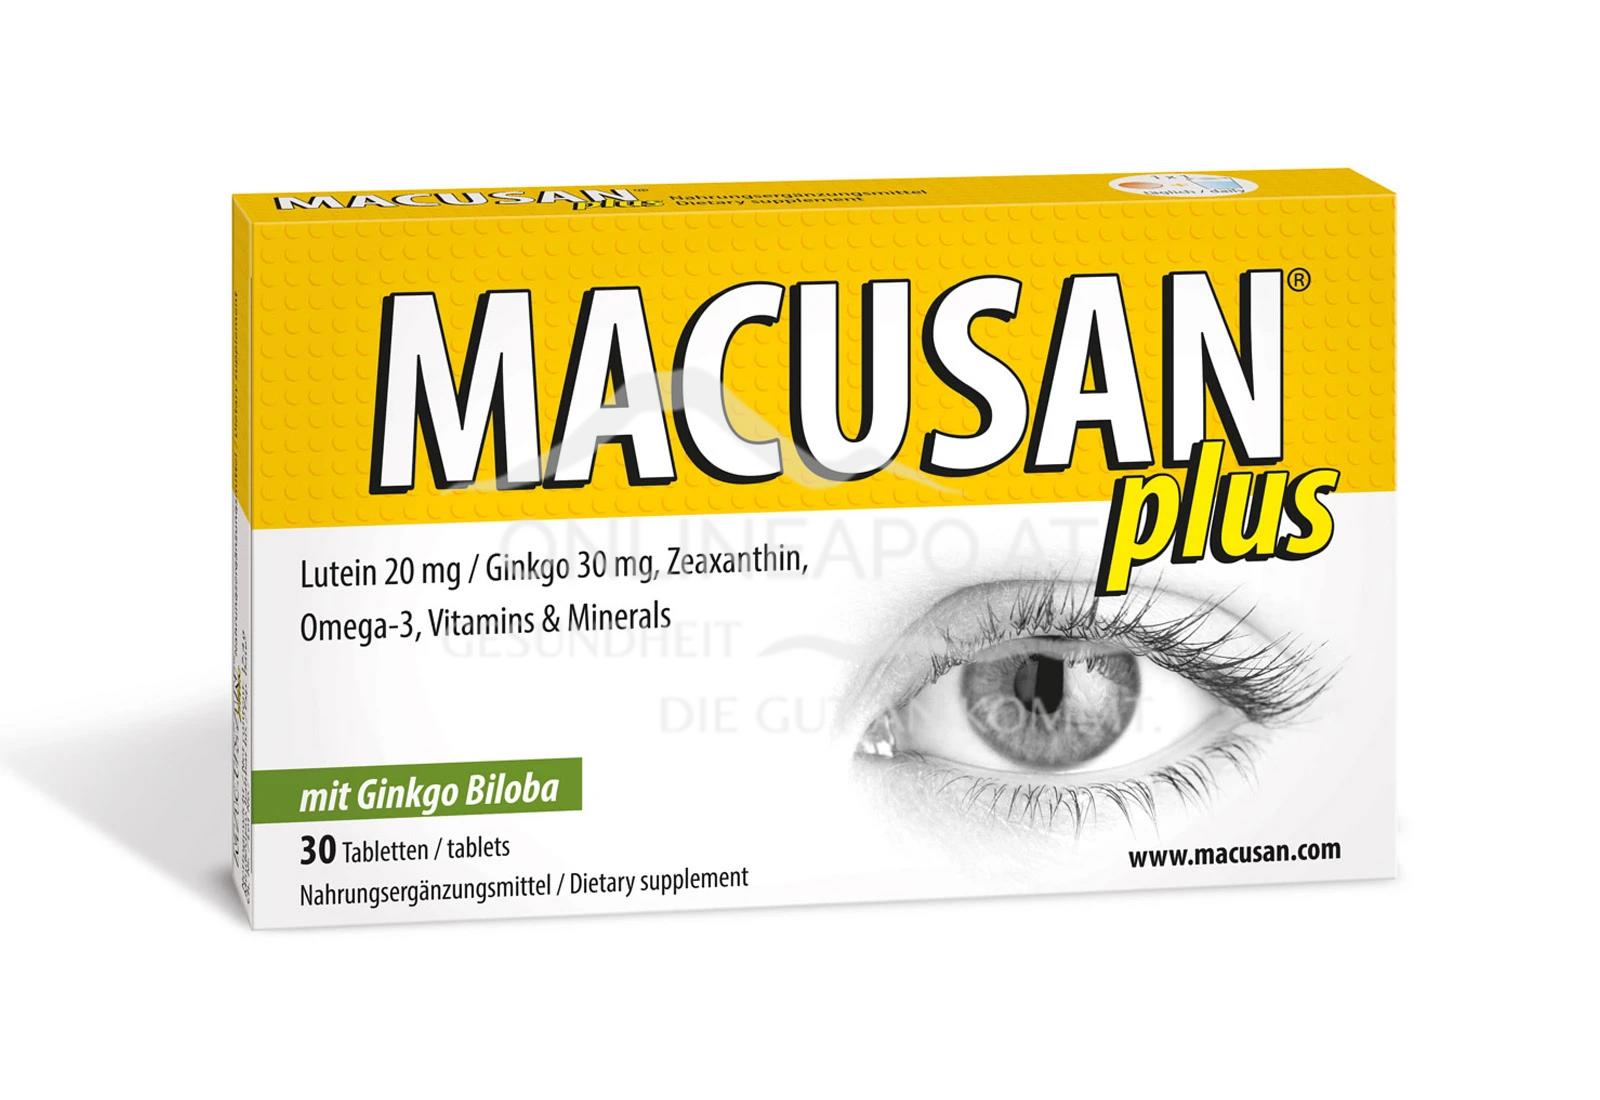 Macusan® plus